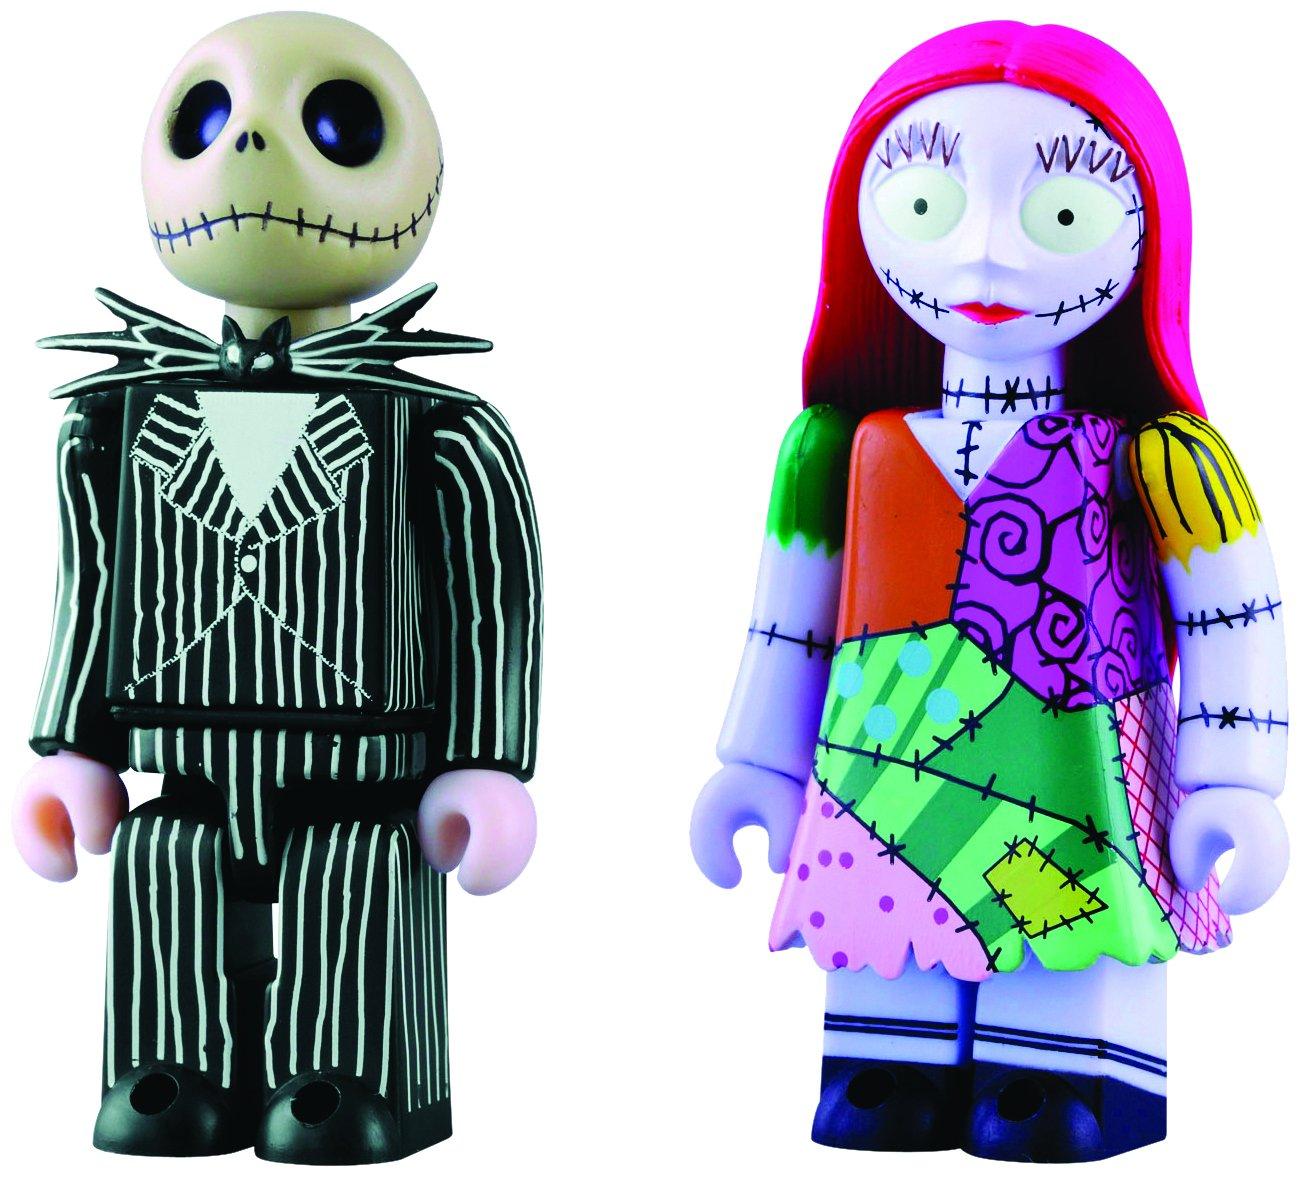 Medicom The Nightmare Before Christmas Jack and Sally Kubrick 2-Pack 2